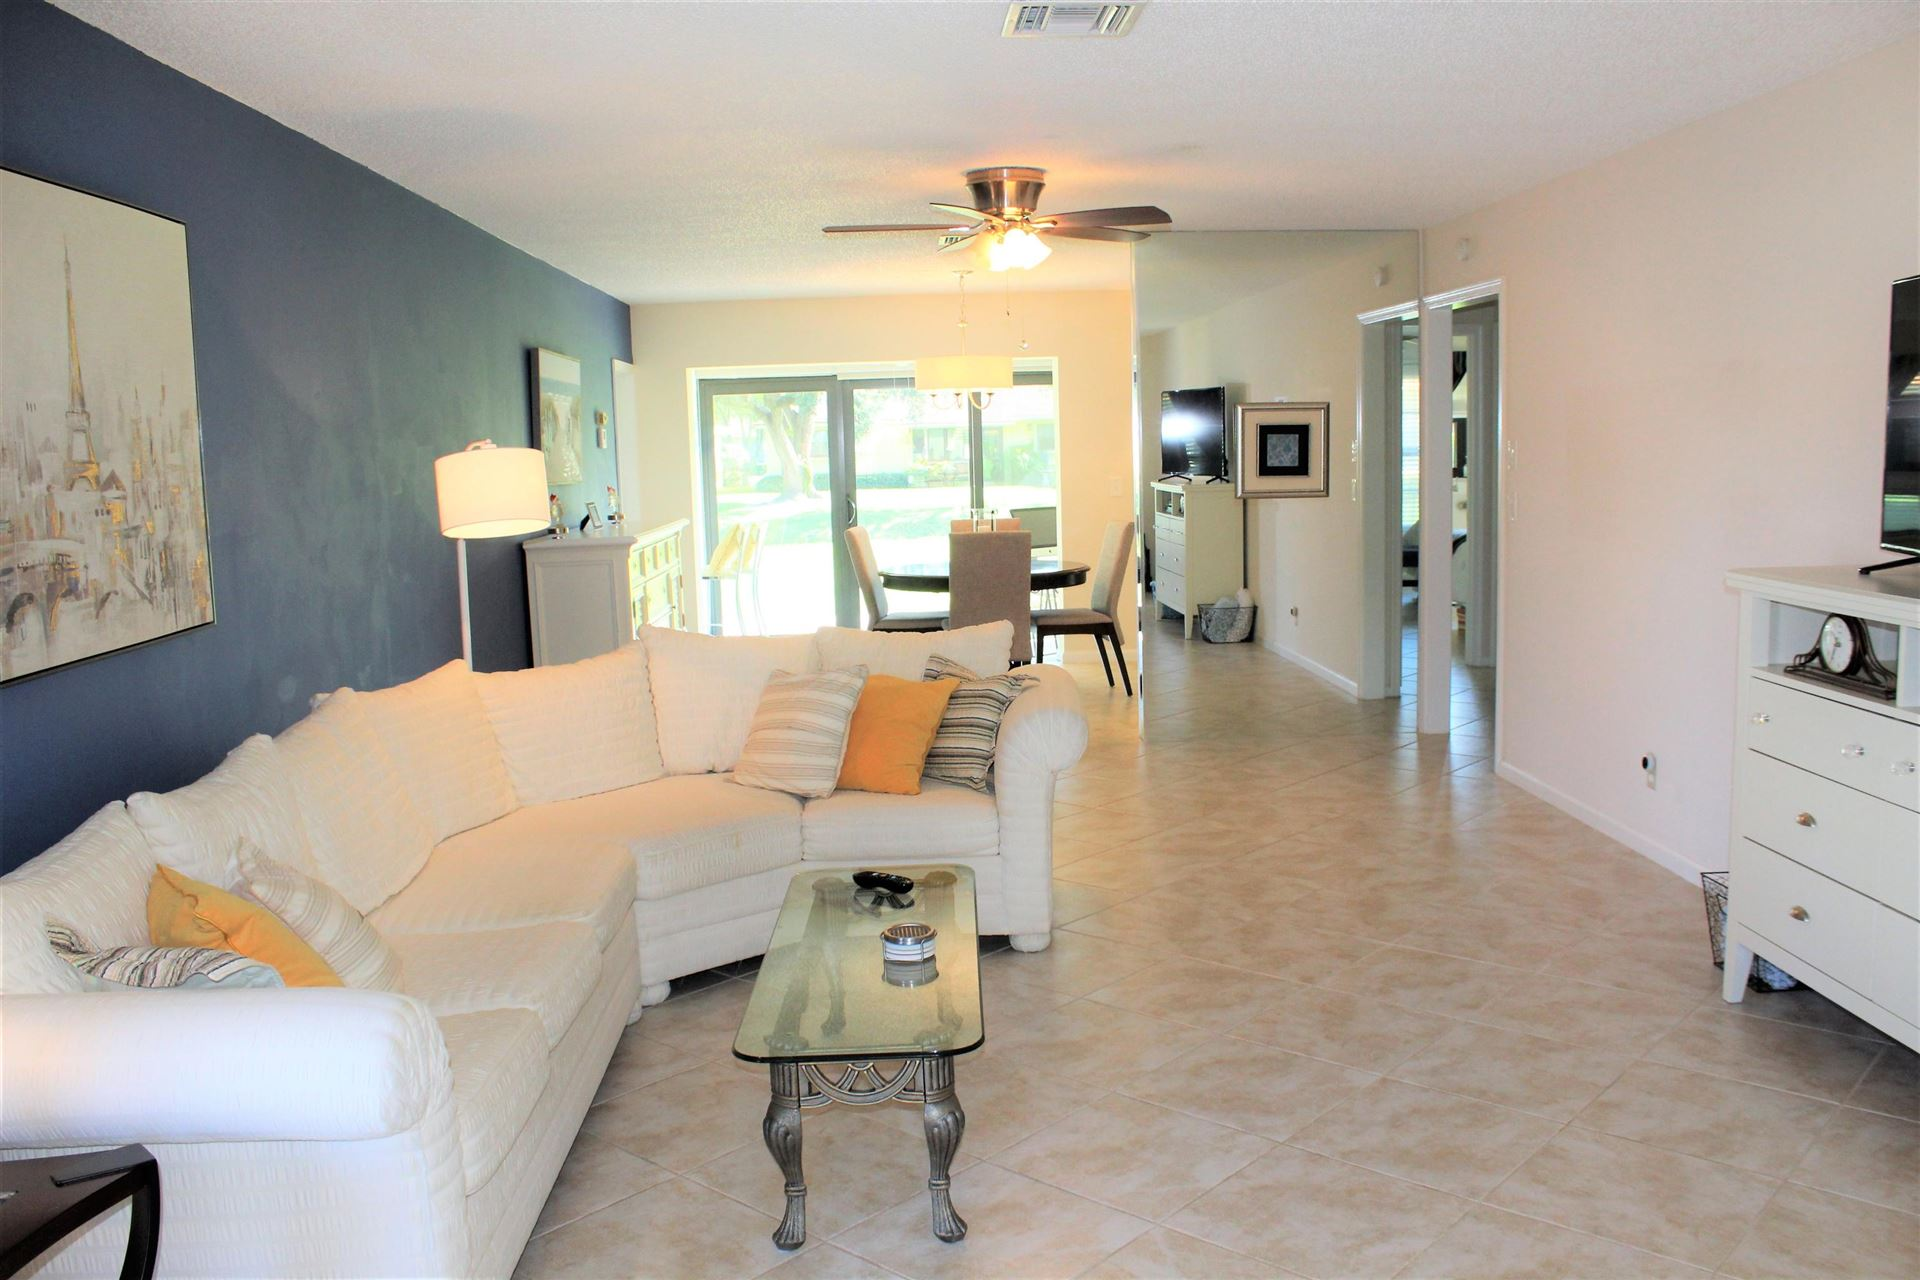 Photo of 9910 Frangipani Tree Way #B, Boynton Beach, FL 33436 (MLS # RX-10671016)